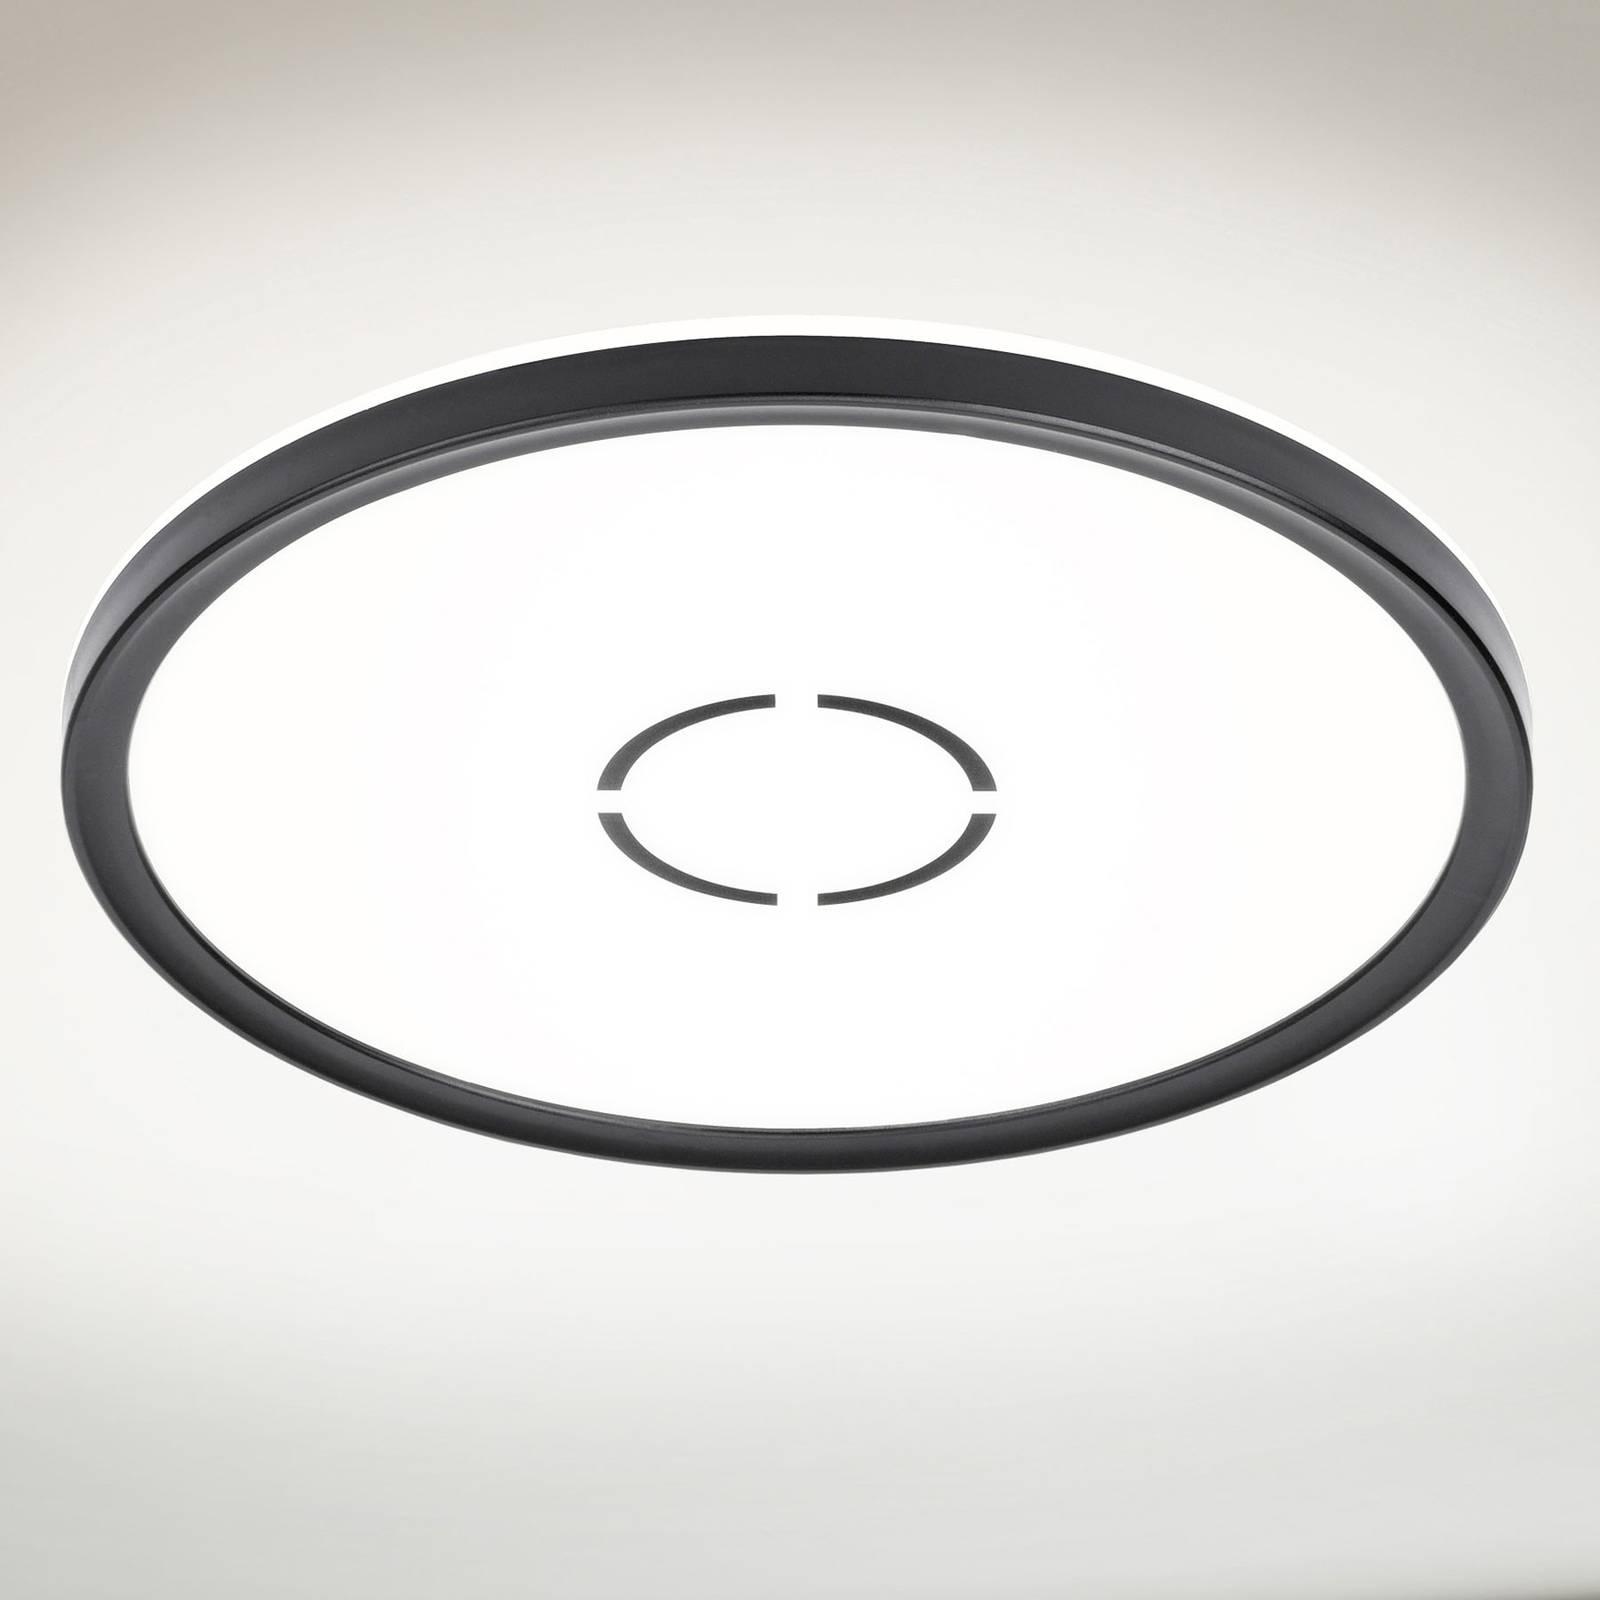 LED-kattovalaisin Free, Ø 29 cm, musta